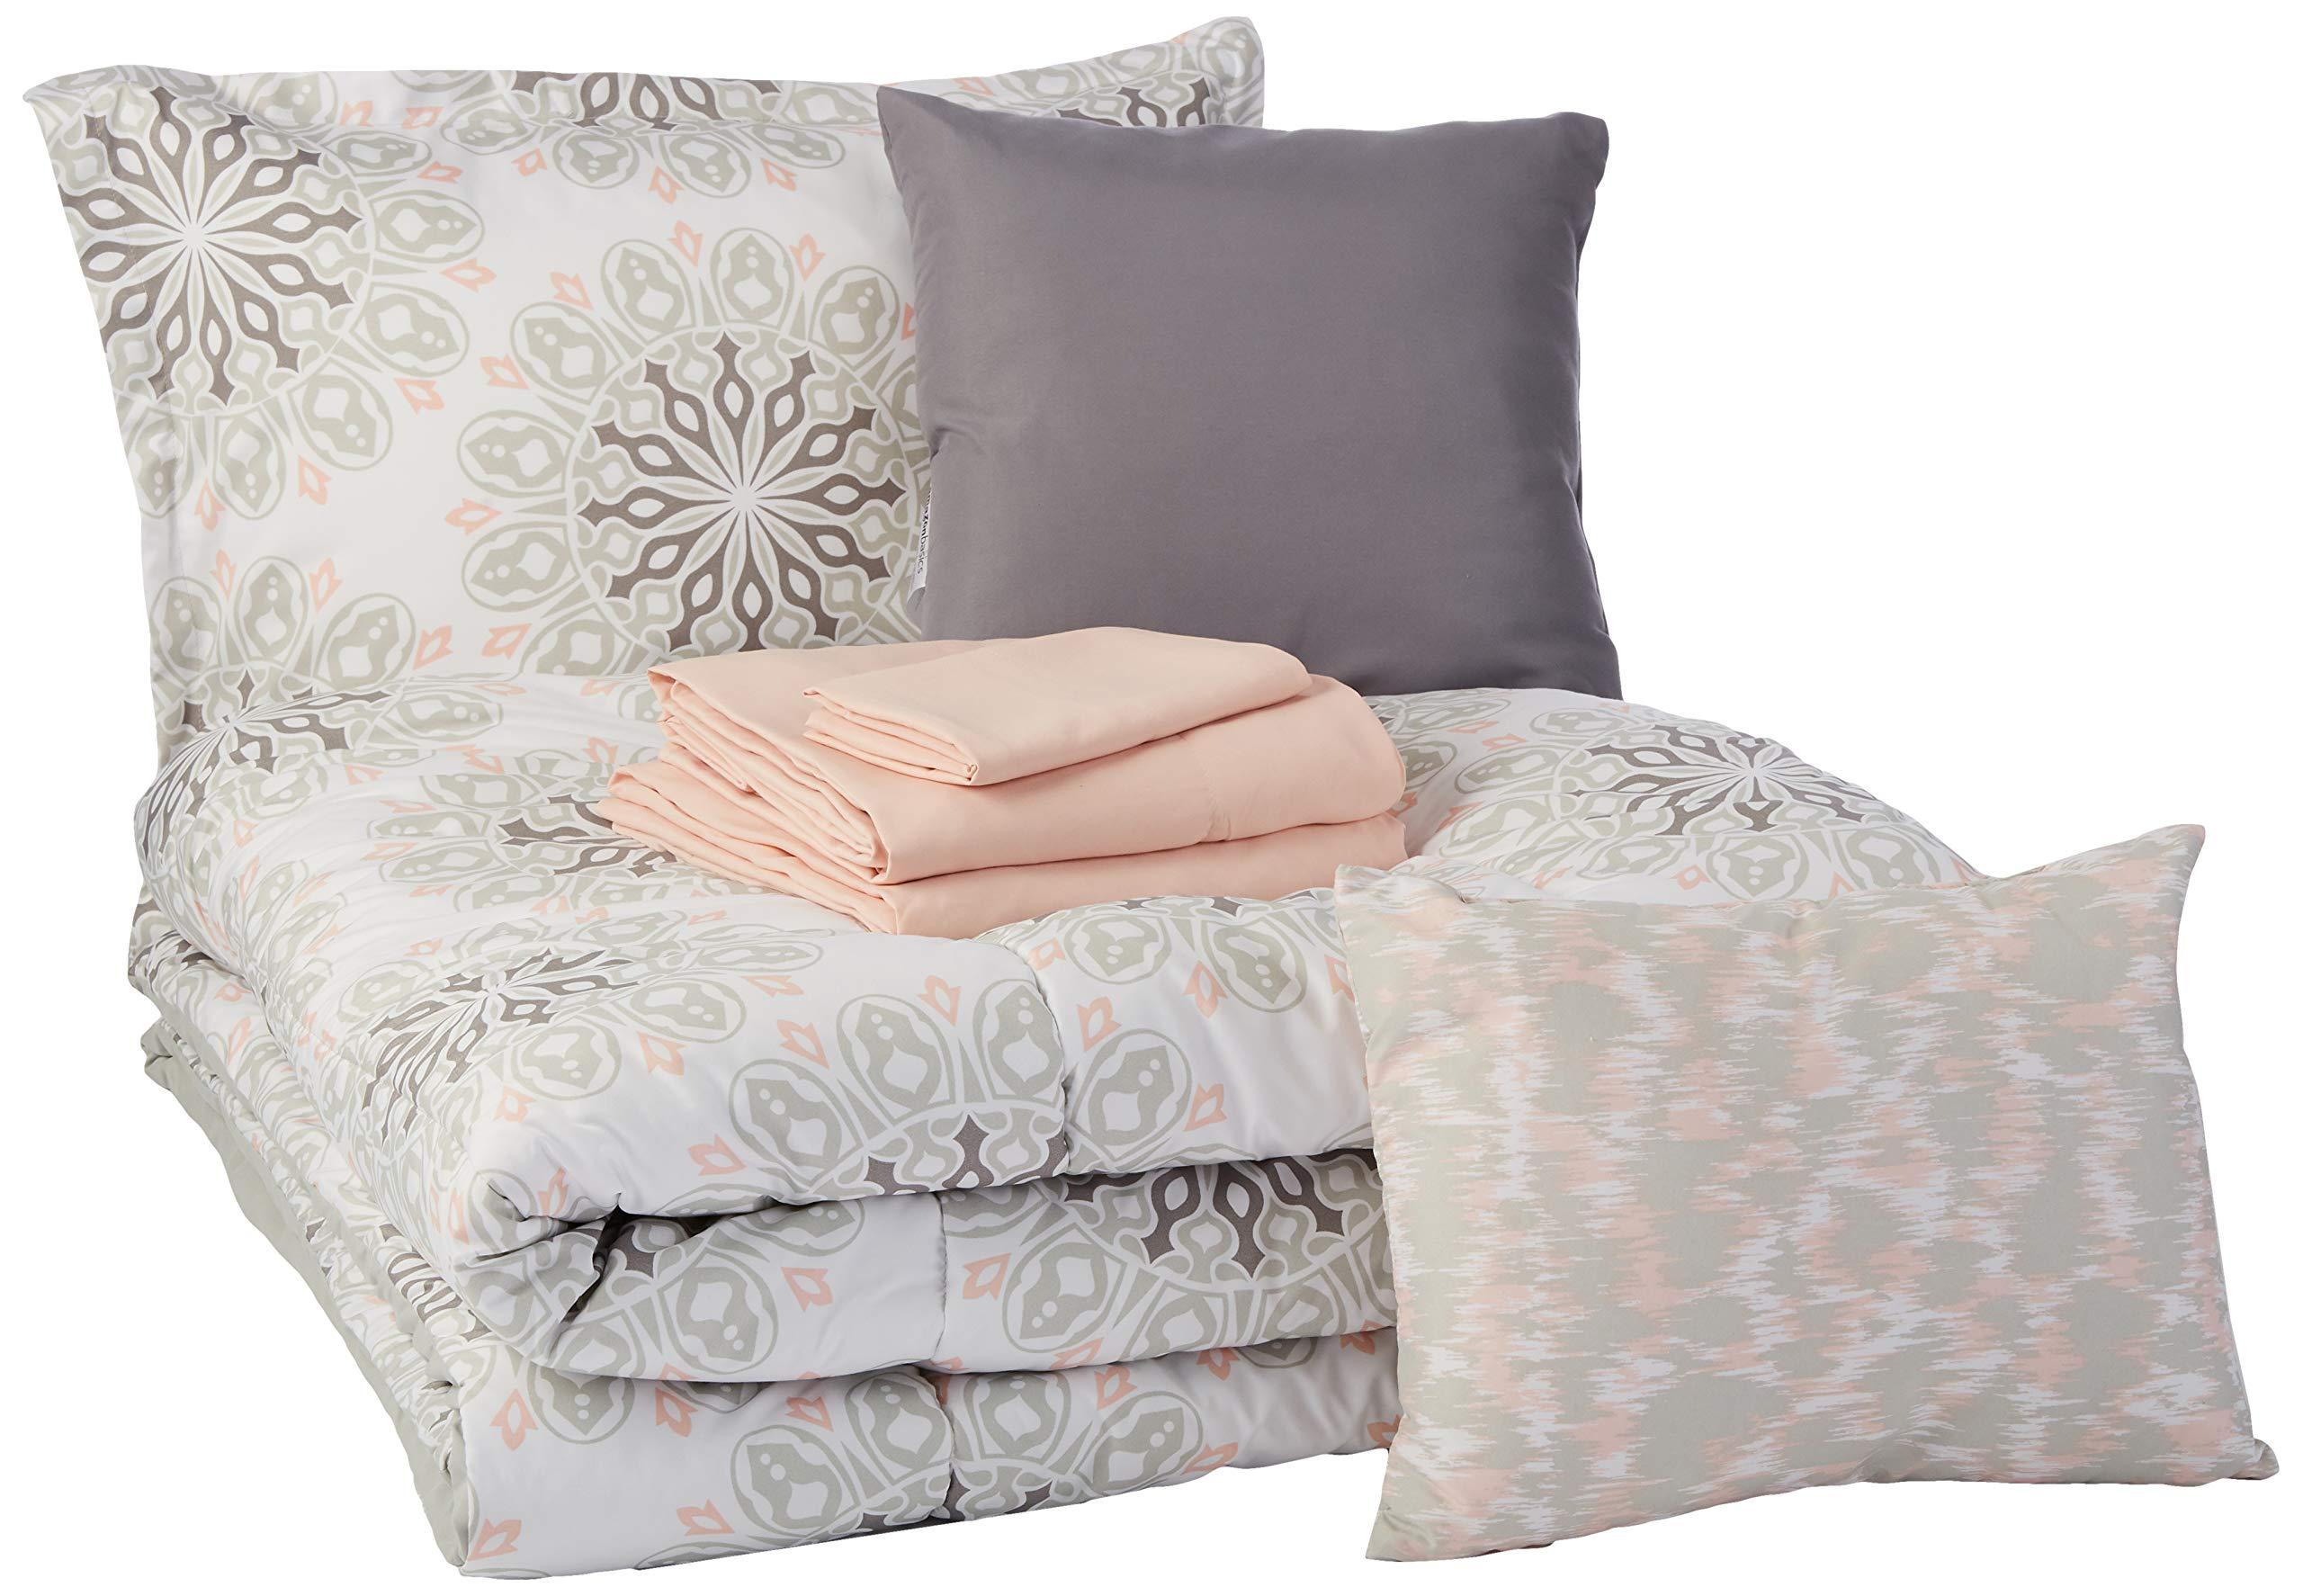 AmazonBasics Bed-in-a-Bag - Soft, Easy-Wash Microfiber - 8-Piece Twin/Twin XL, Grey Boho Medallion